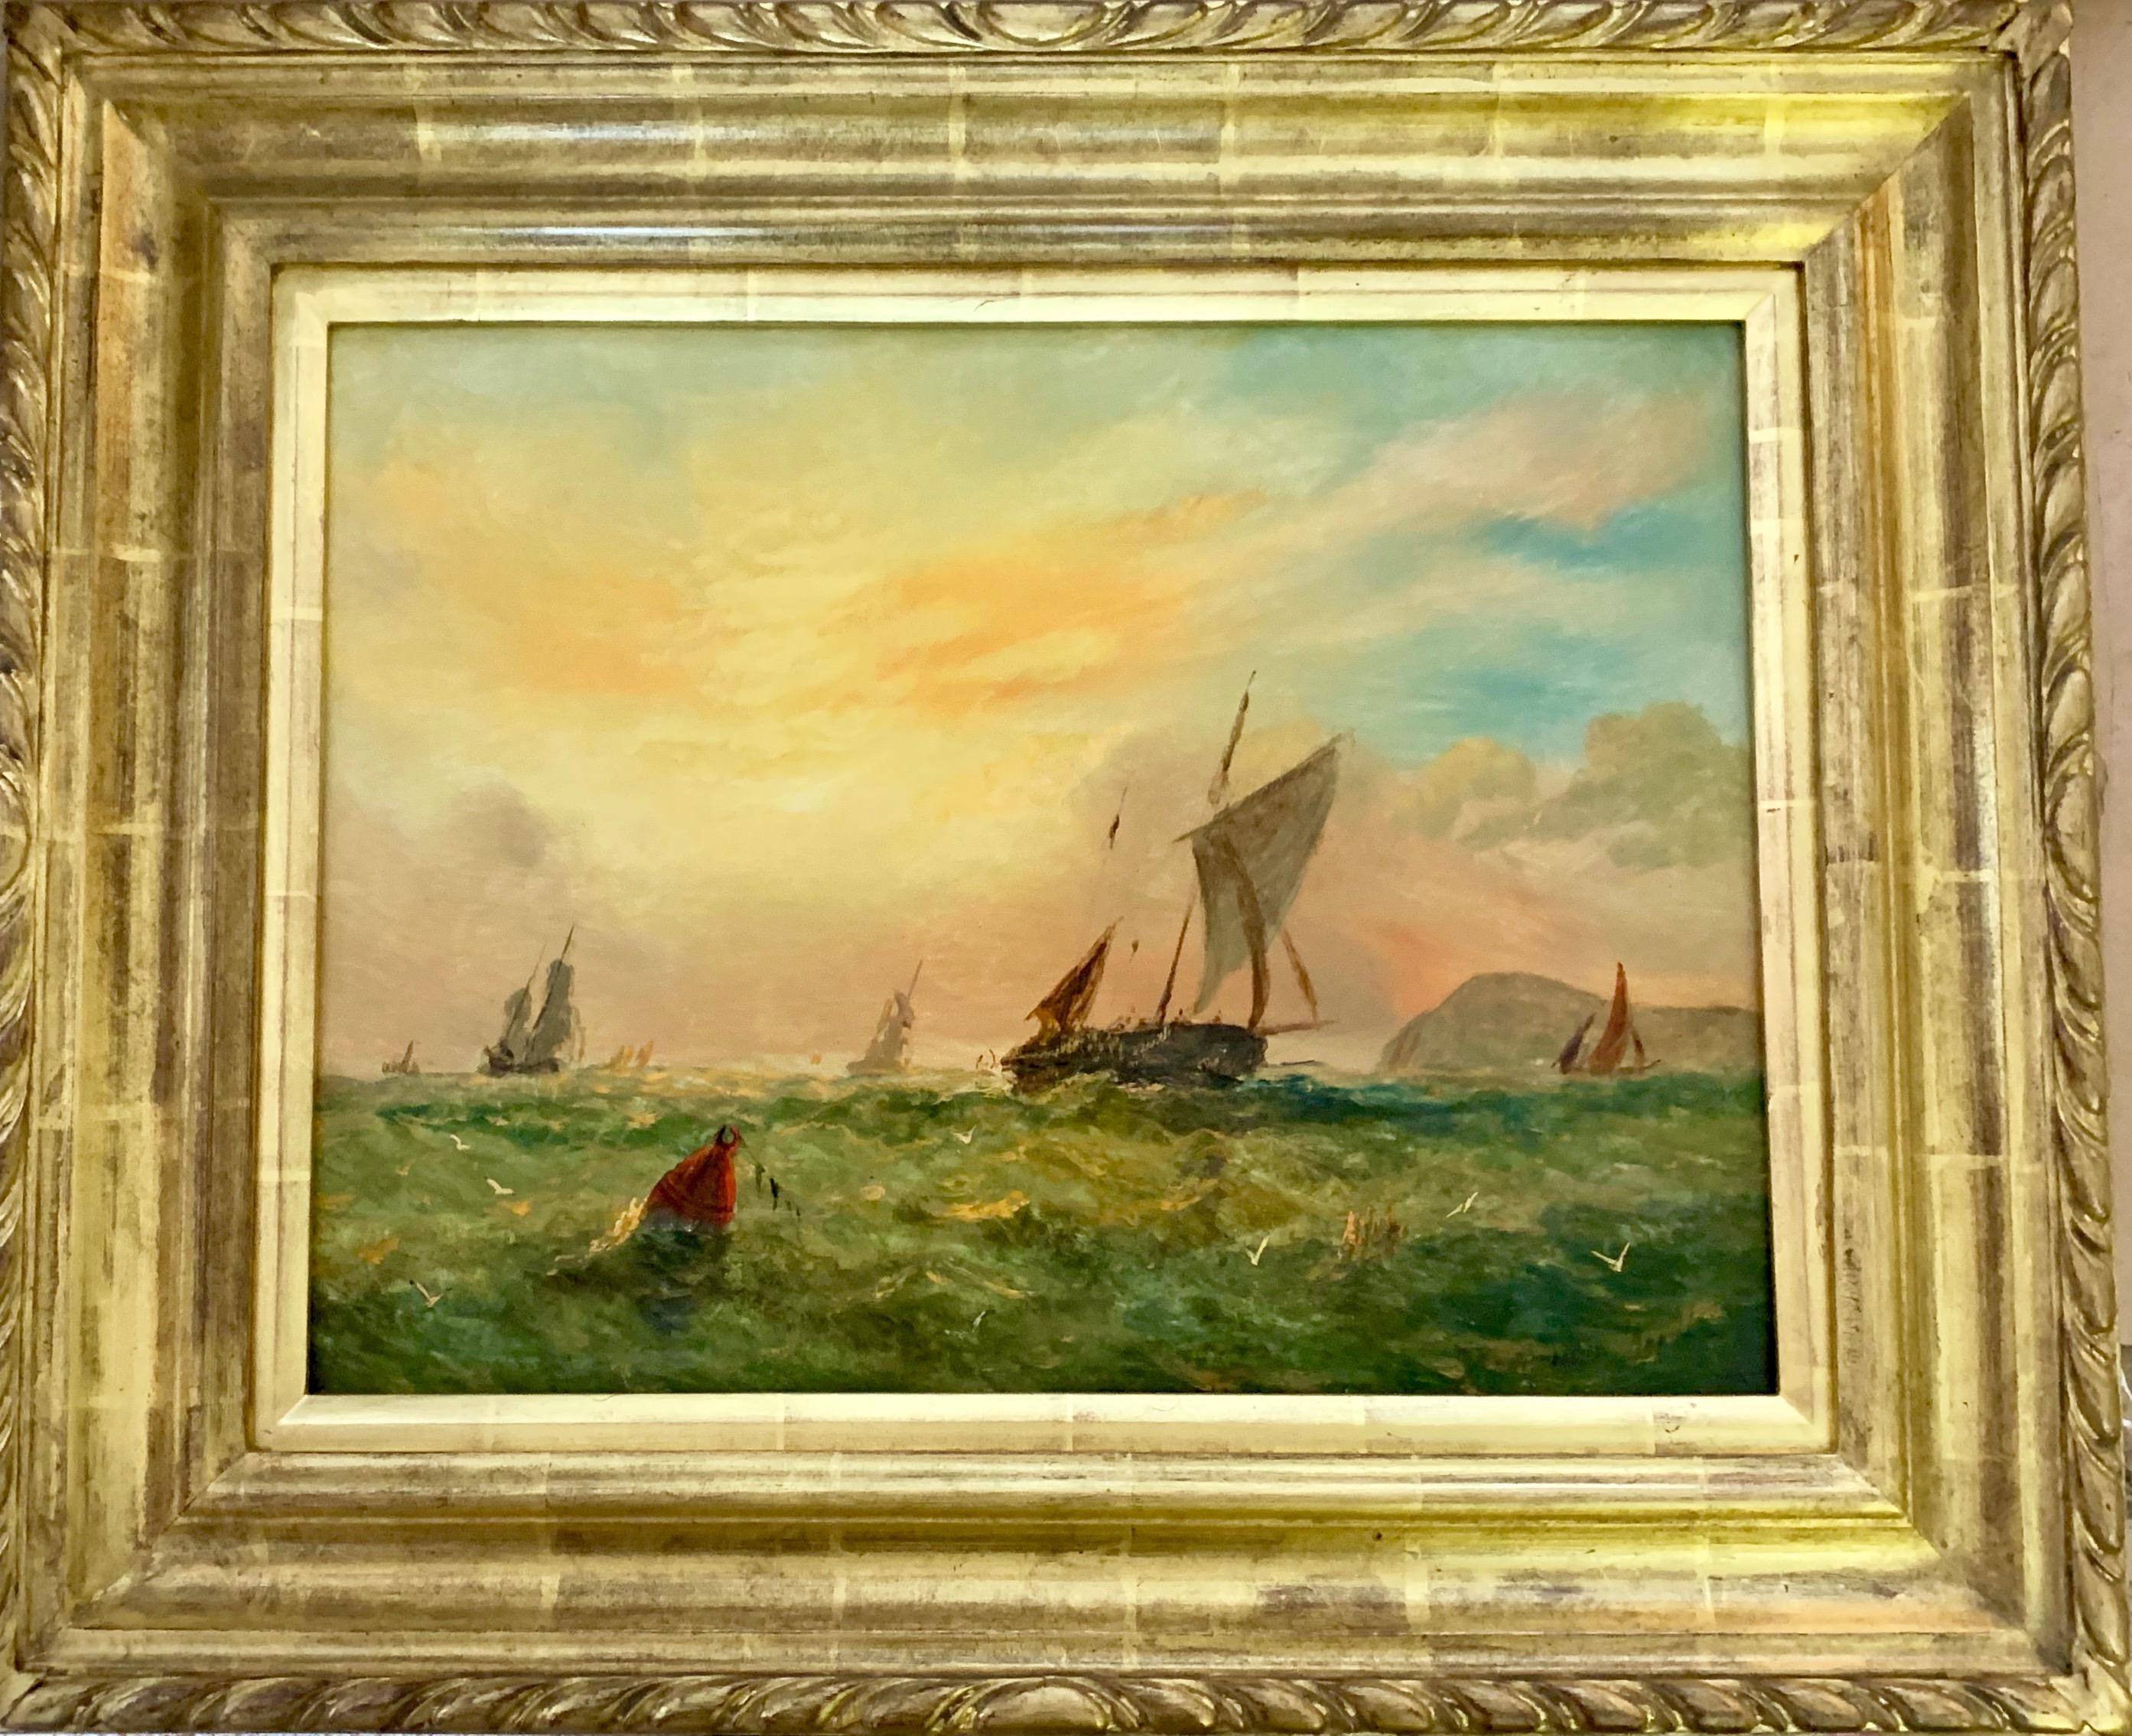 Victorian 19th century English sailing yacht off the English coast